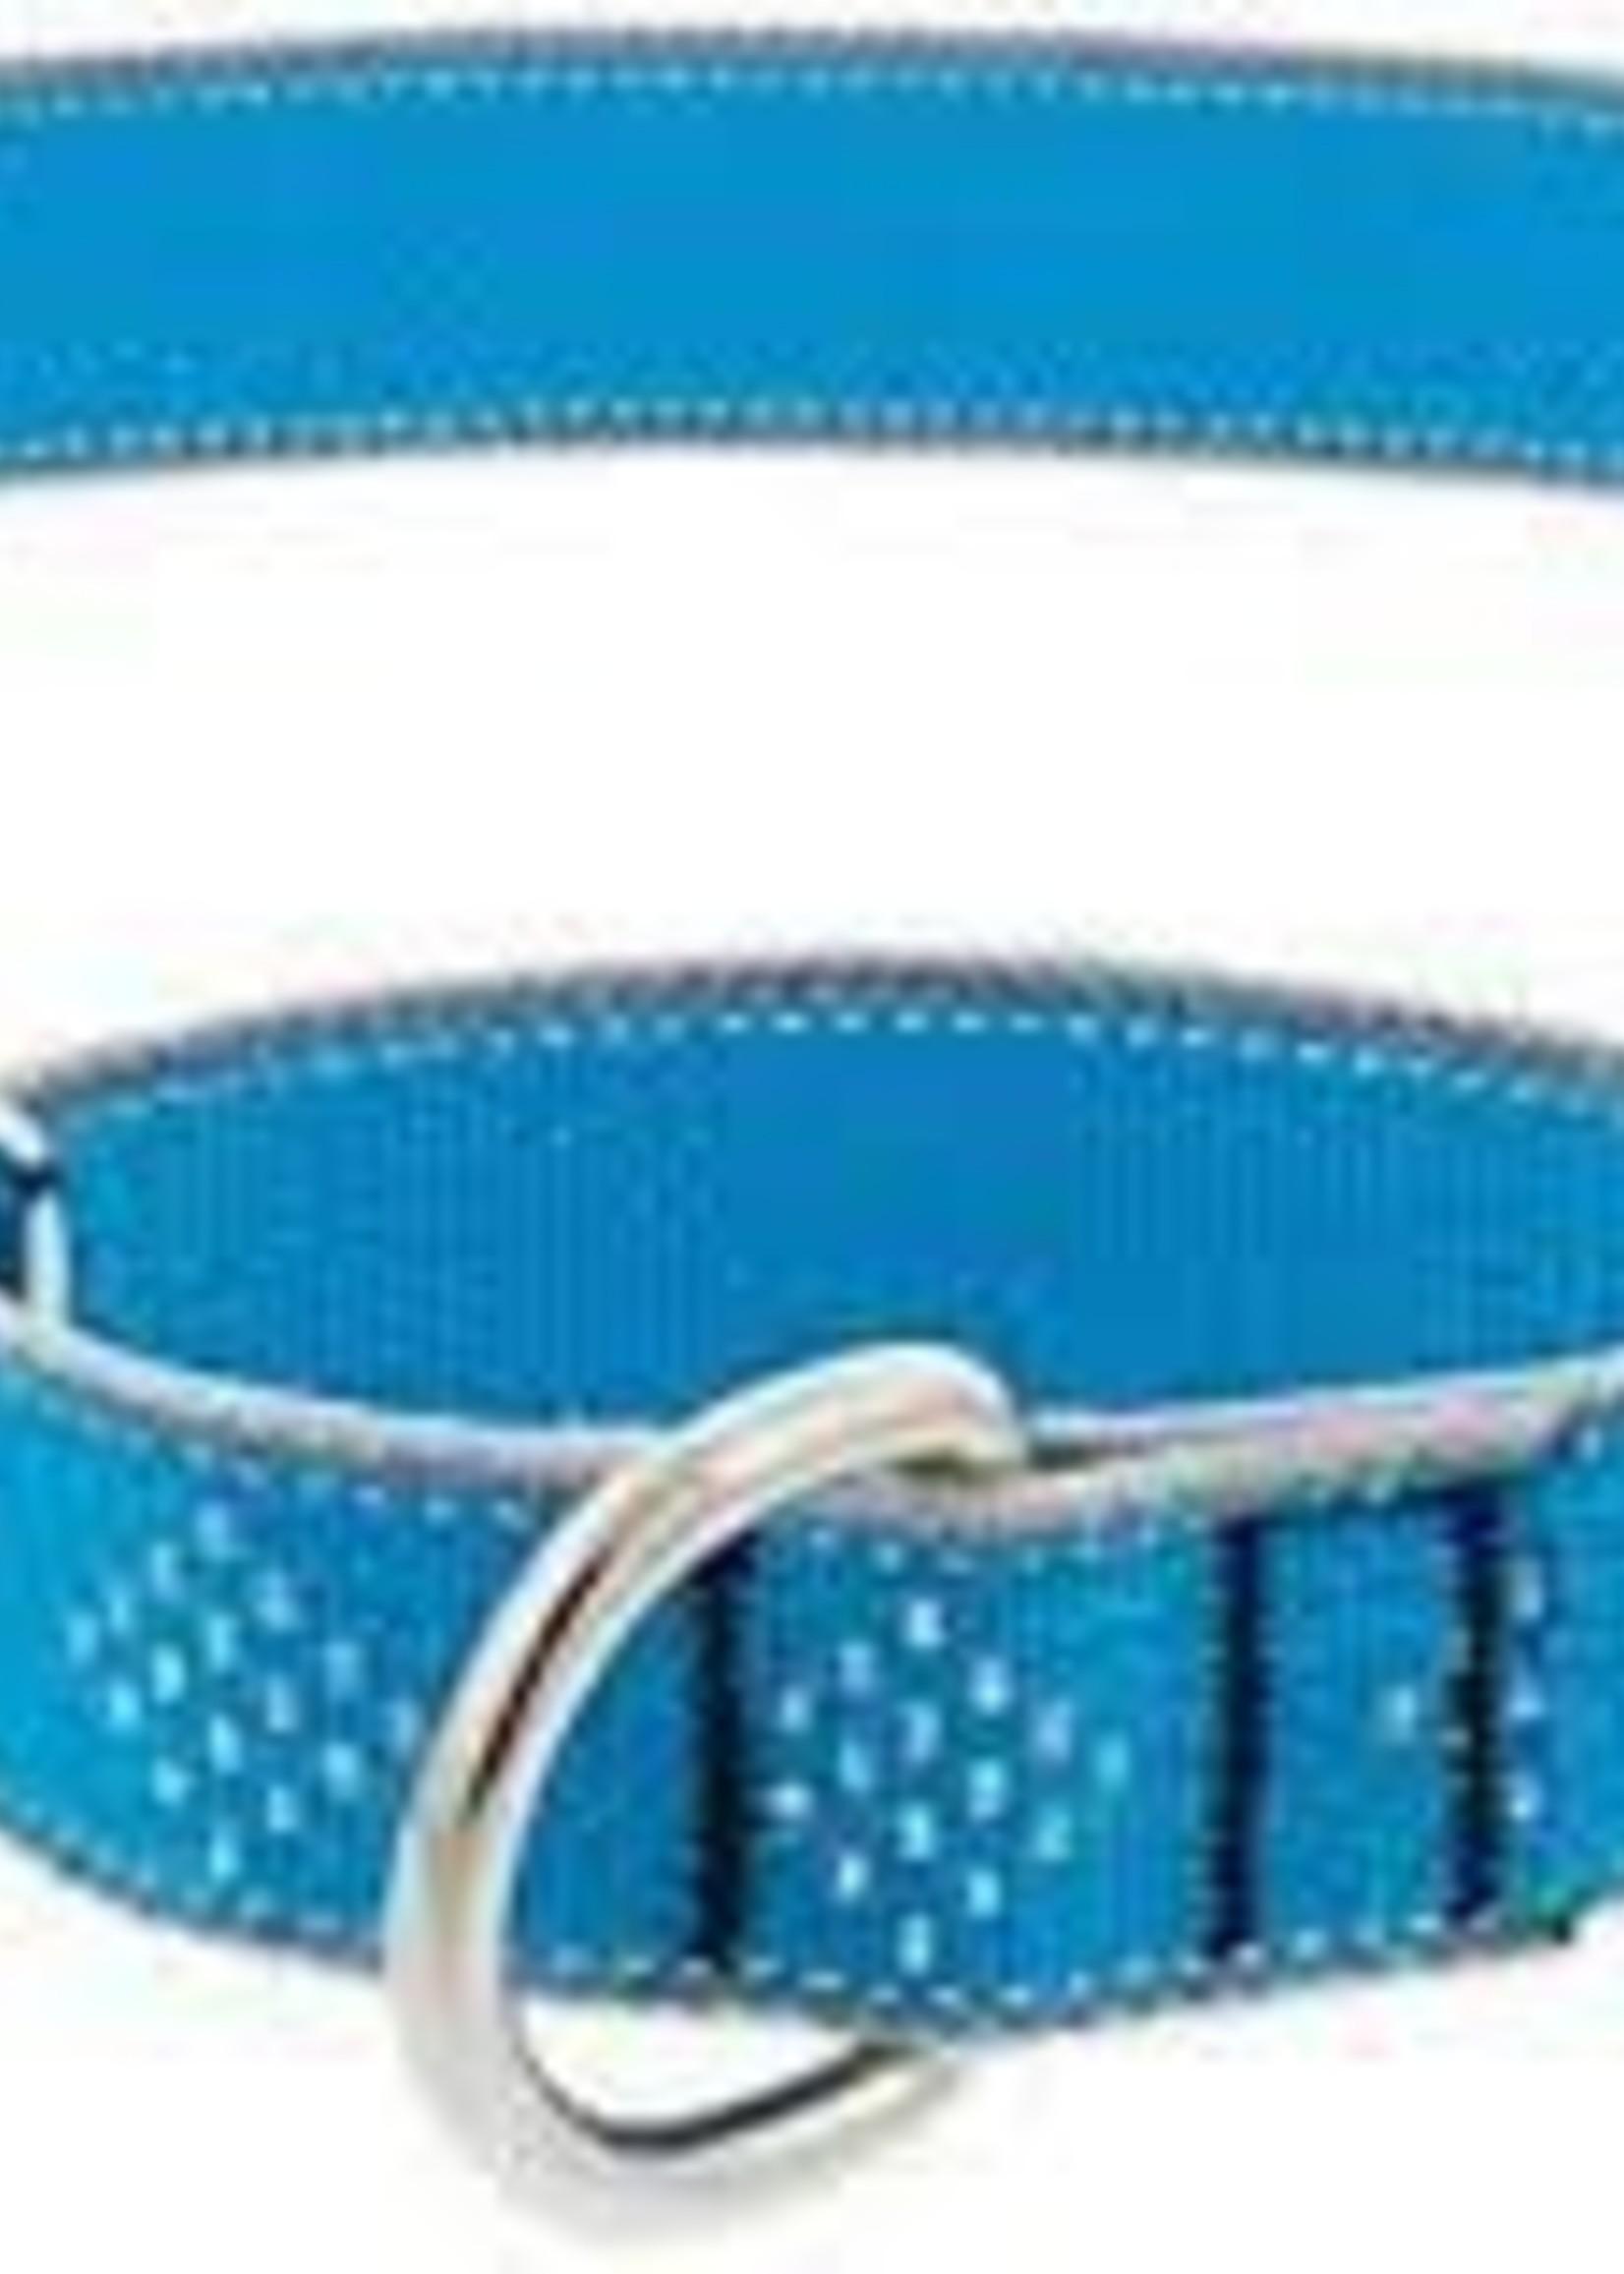 LupinePet Lupine 1in Blue Diamond Reflective 16-28 Adj Collar